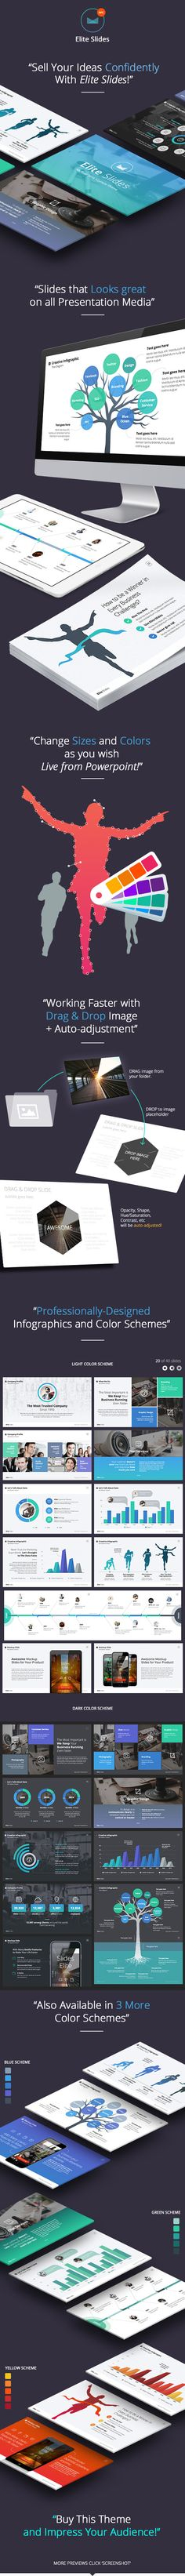 Slides Elite - Powerpoint Template (Vol. 1)